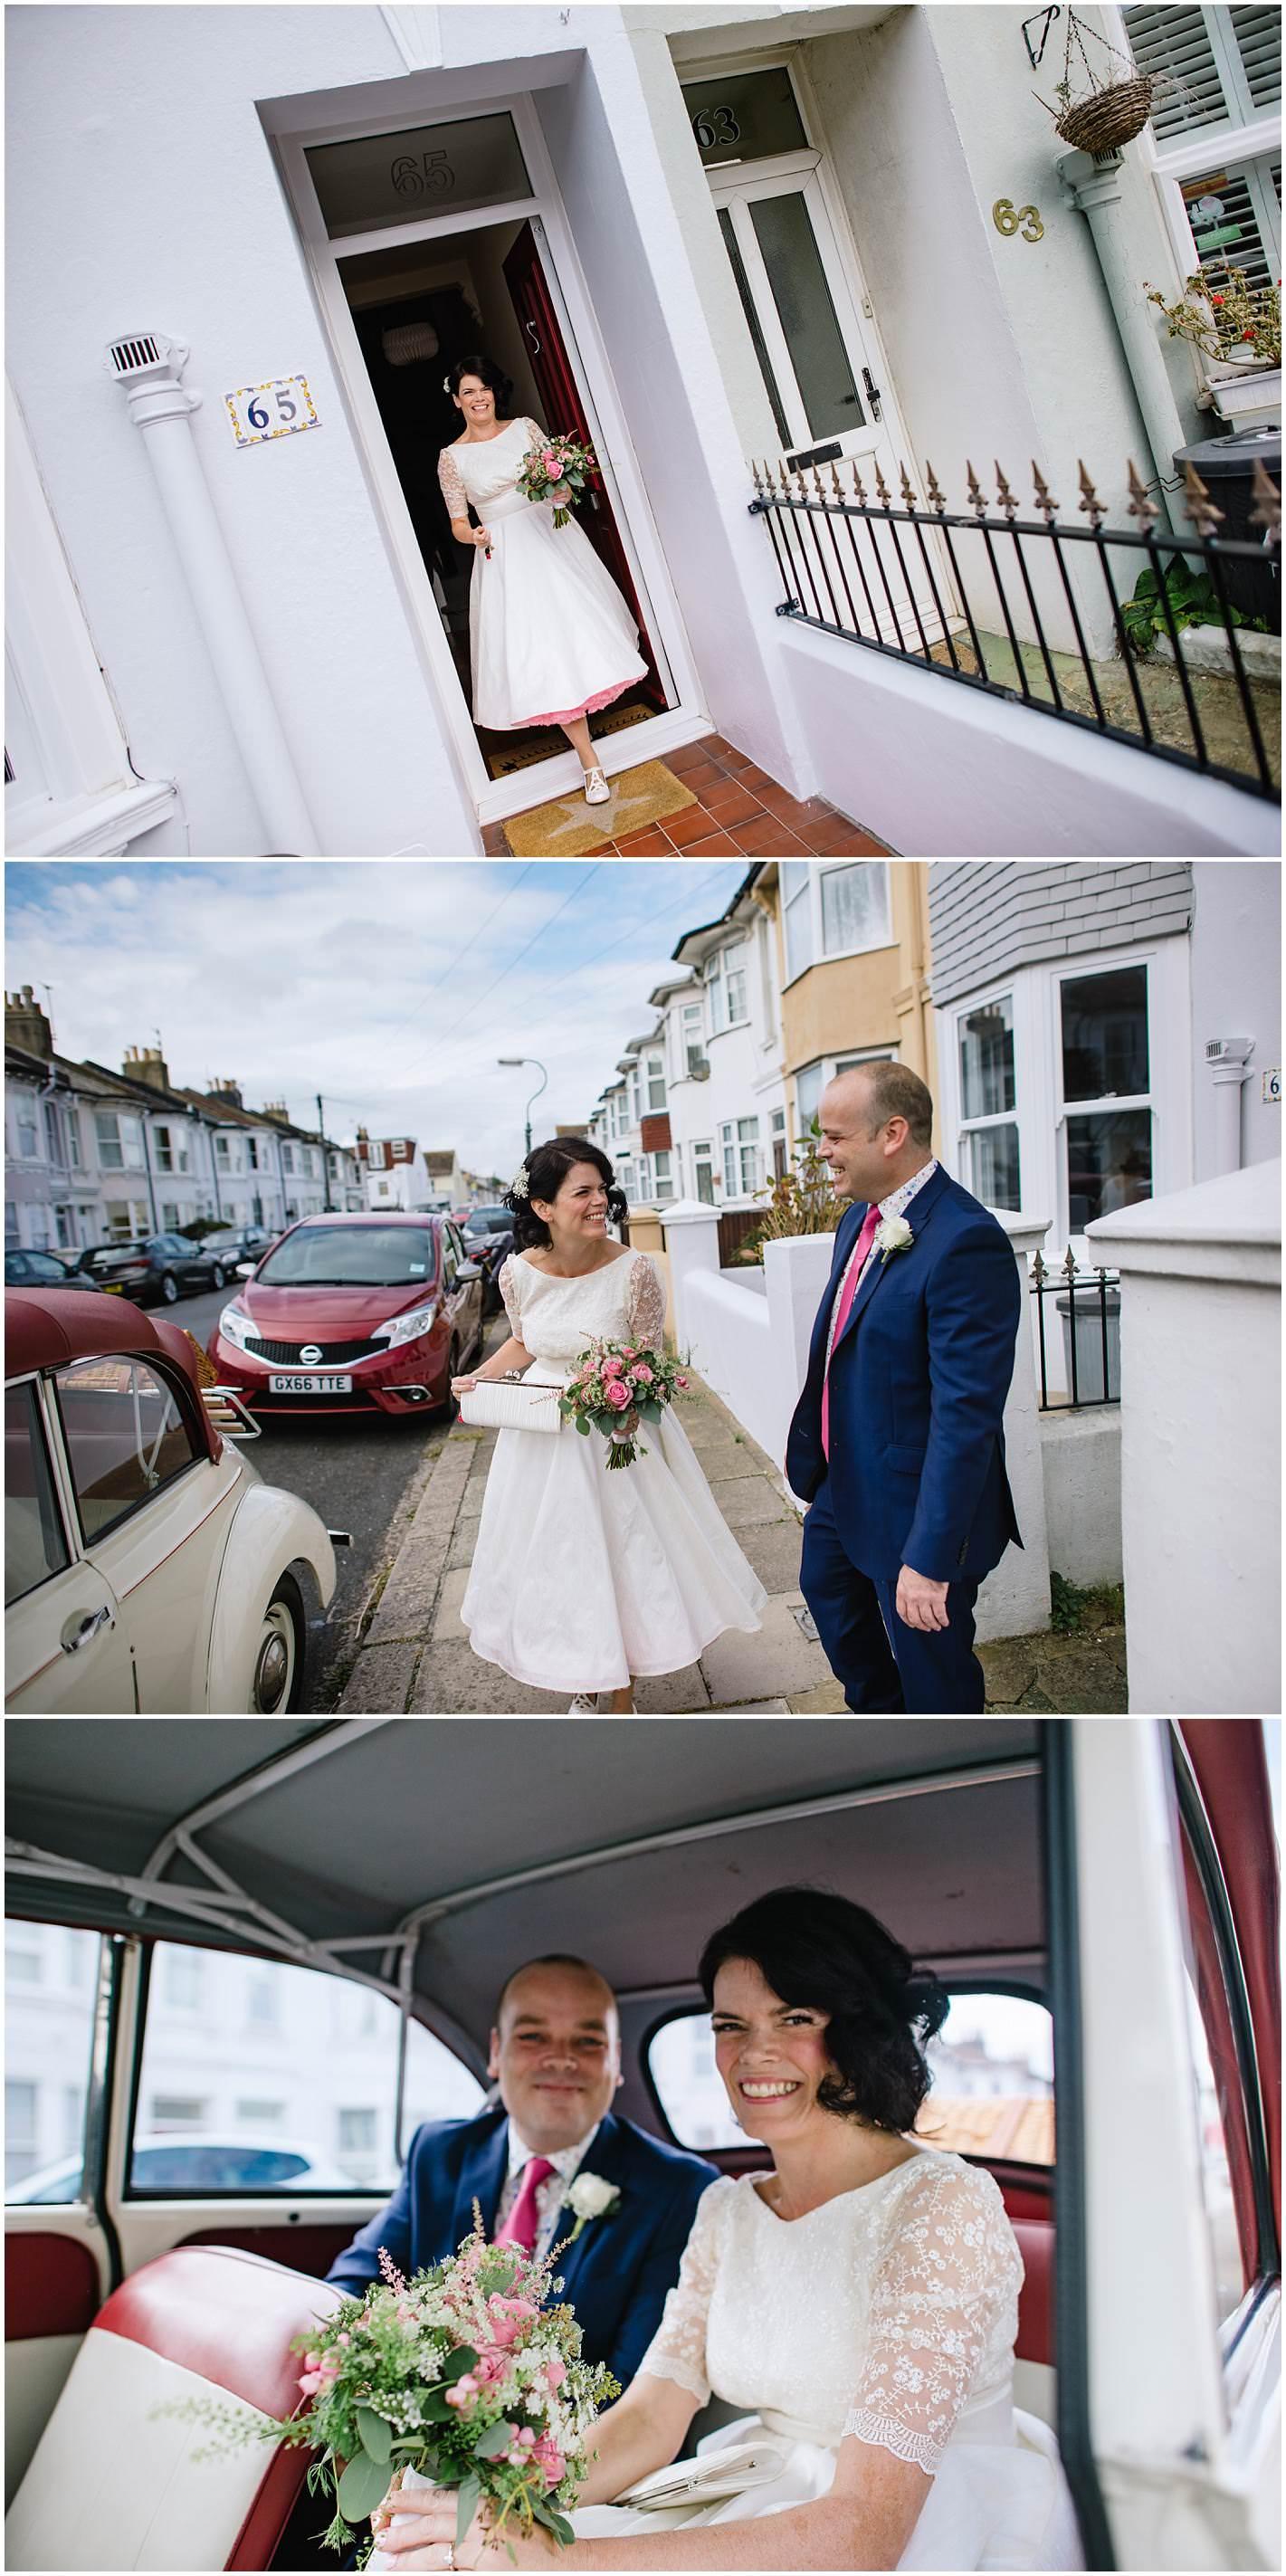 royal-pavilion-wedding-brighton372